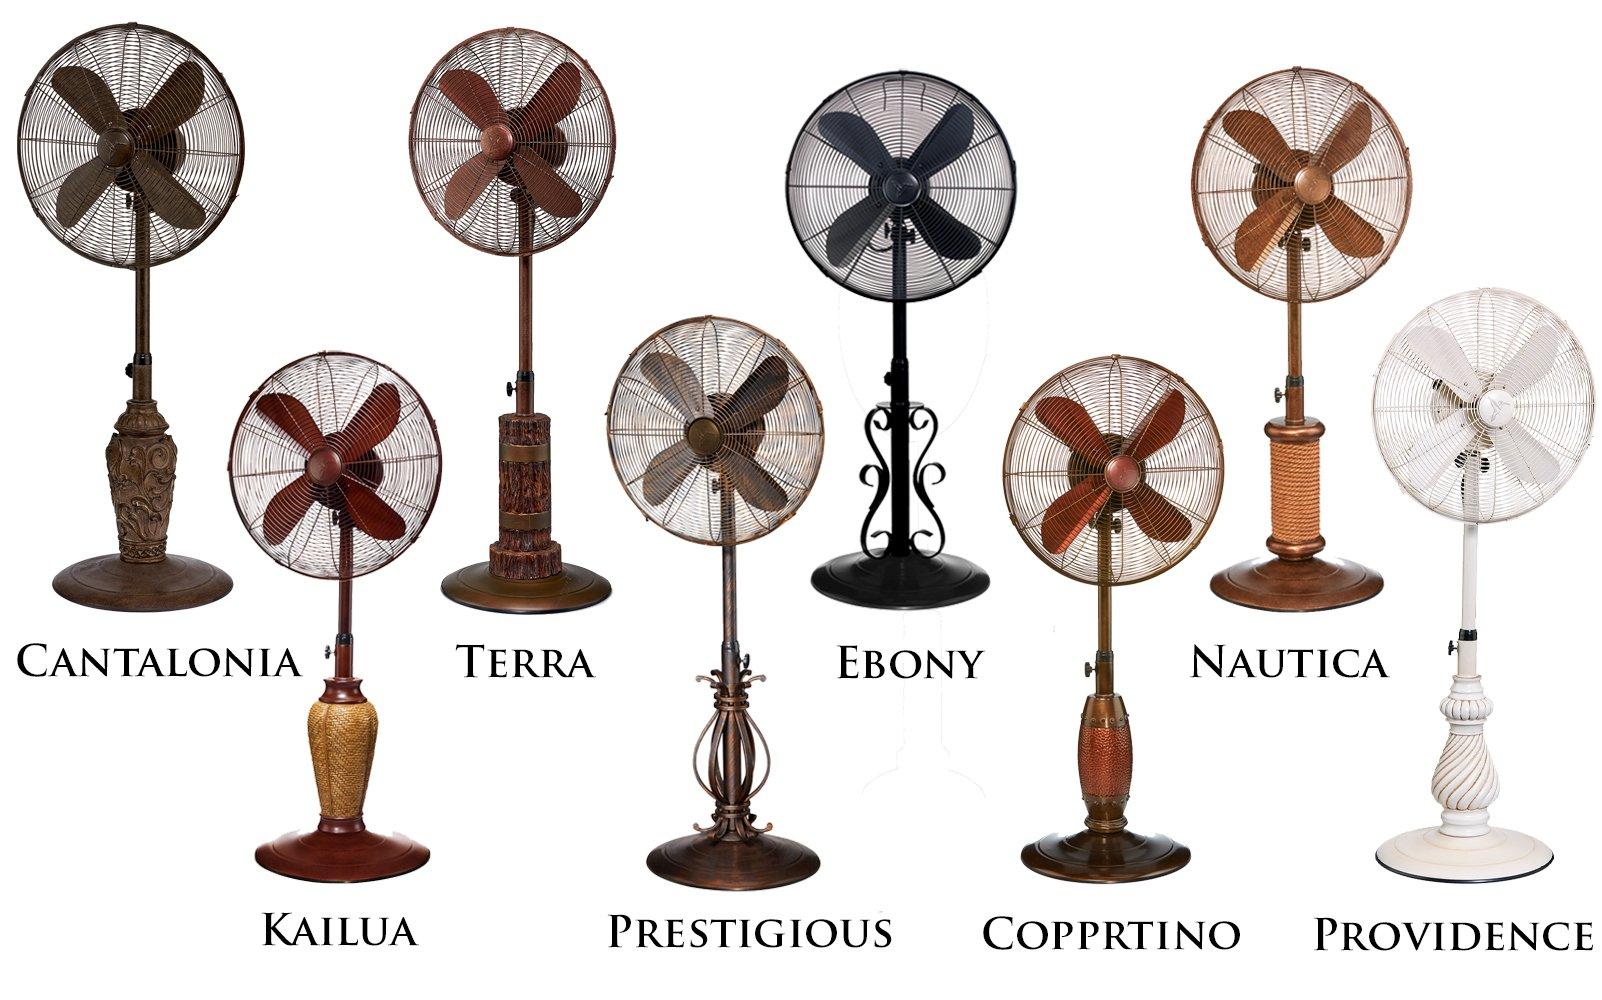 DecoBREEZE Pedestal Fan Outdoor, Oscillating Standing Adjustable Patio Fan, 18 Inch, Prestigious